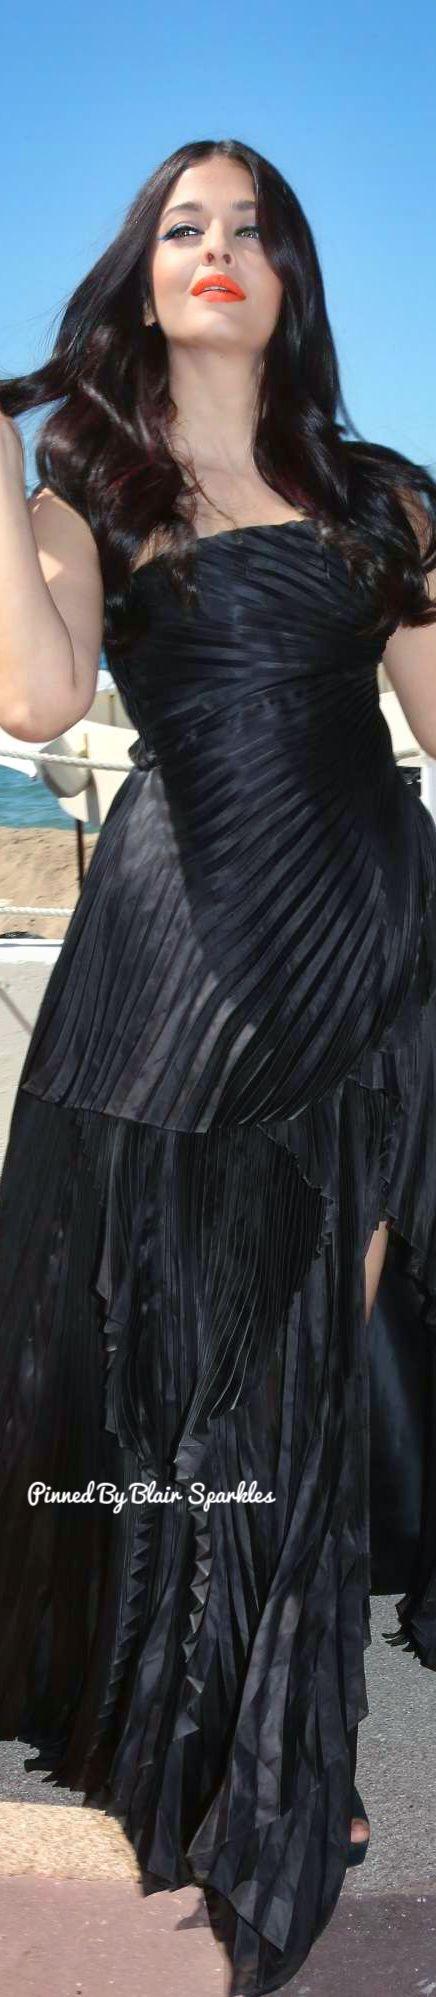 Aishwarya Rai At Cannes Film Festival 2017 ♕♚εїз   BLAIR SPARKLES  